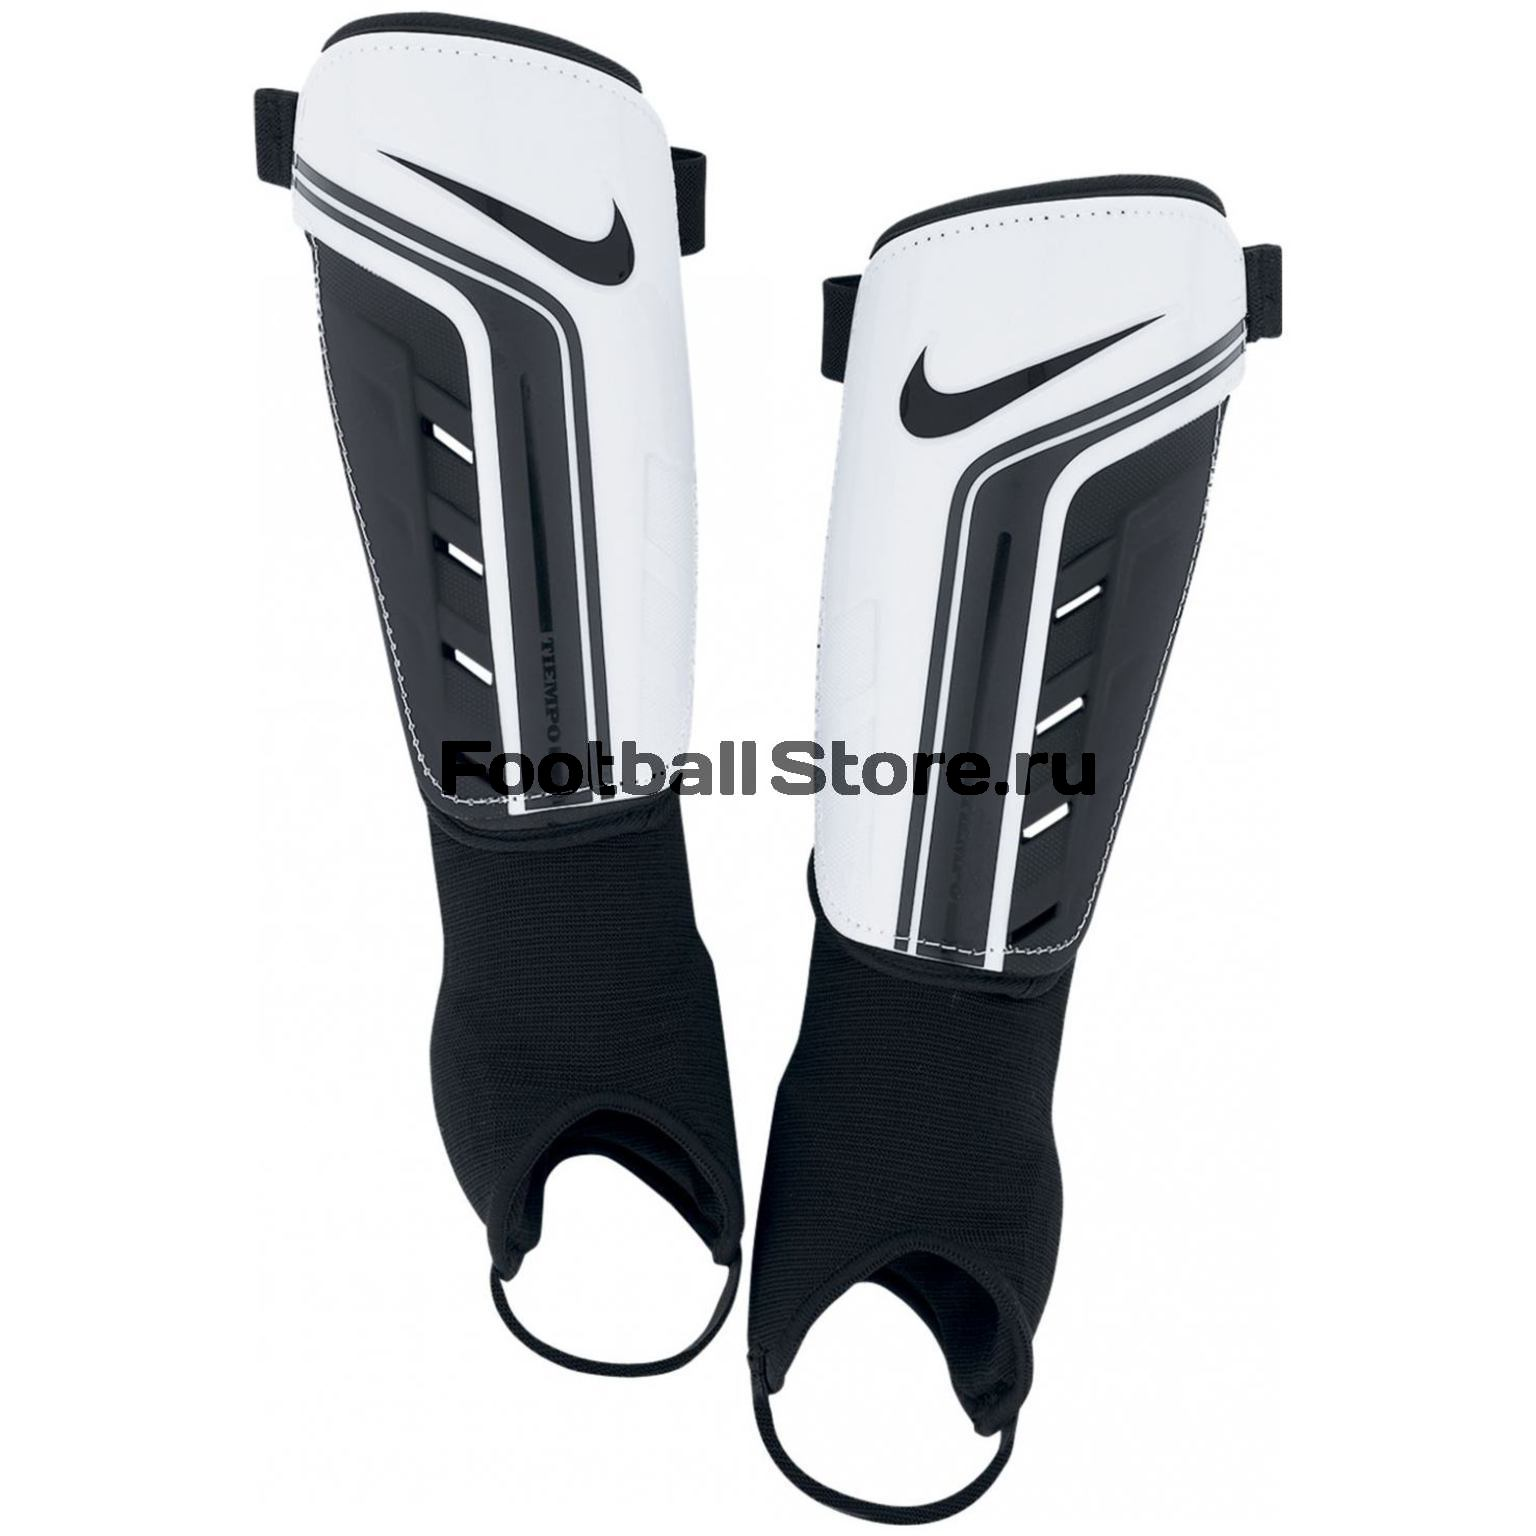 Защита ног Nike Щитки Nike YOUTH SHIELD